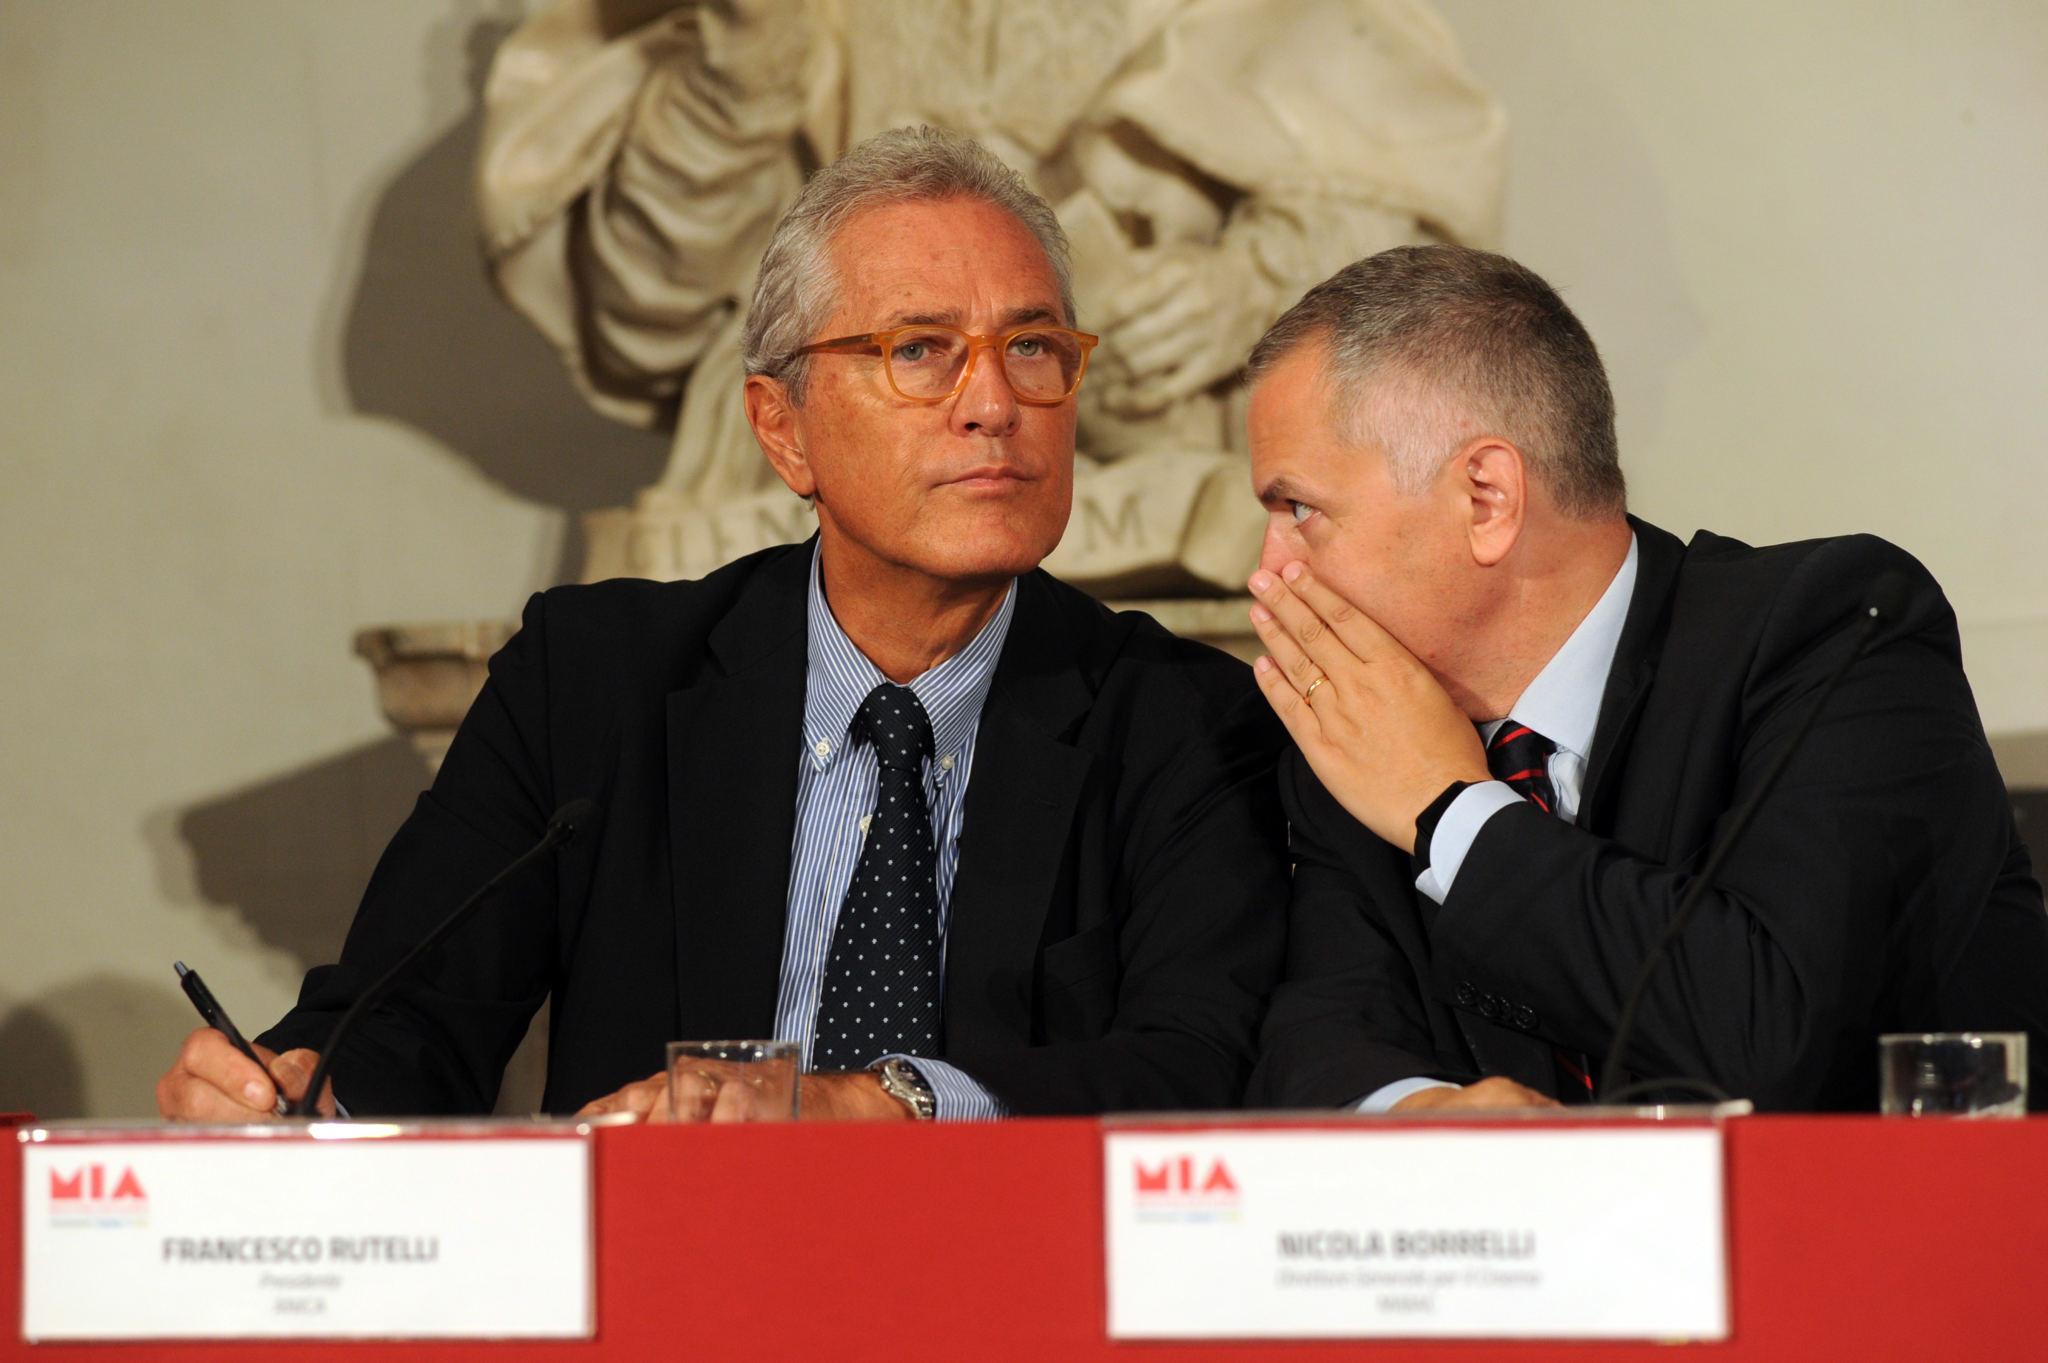 Francesco Rutelli (ANICA President), Nicola Borrelli (MIBAC General Director for Cinema)